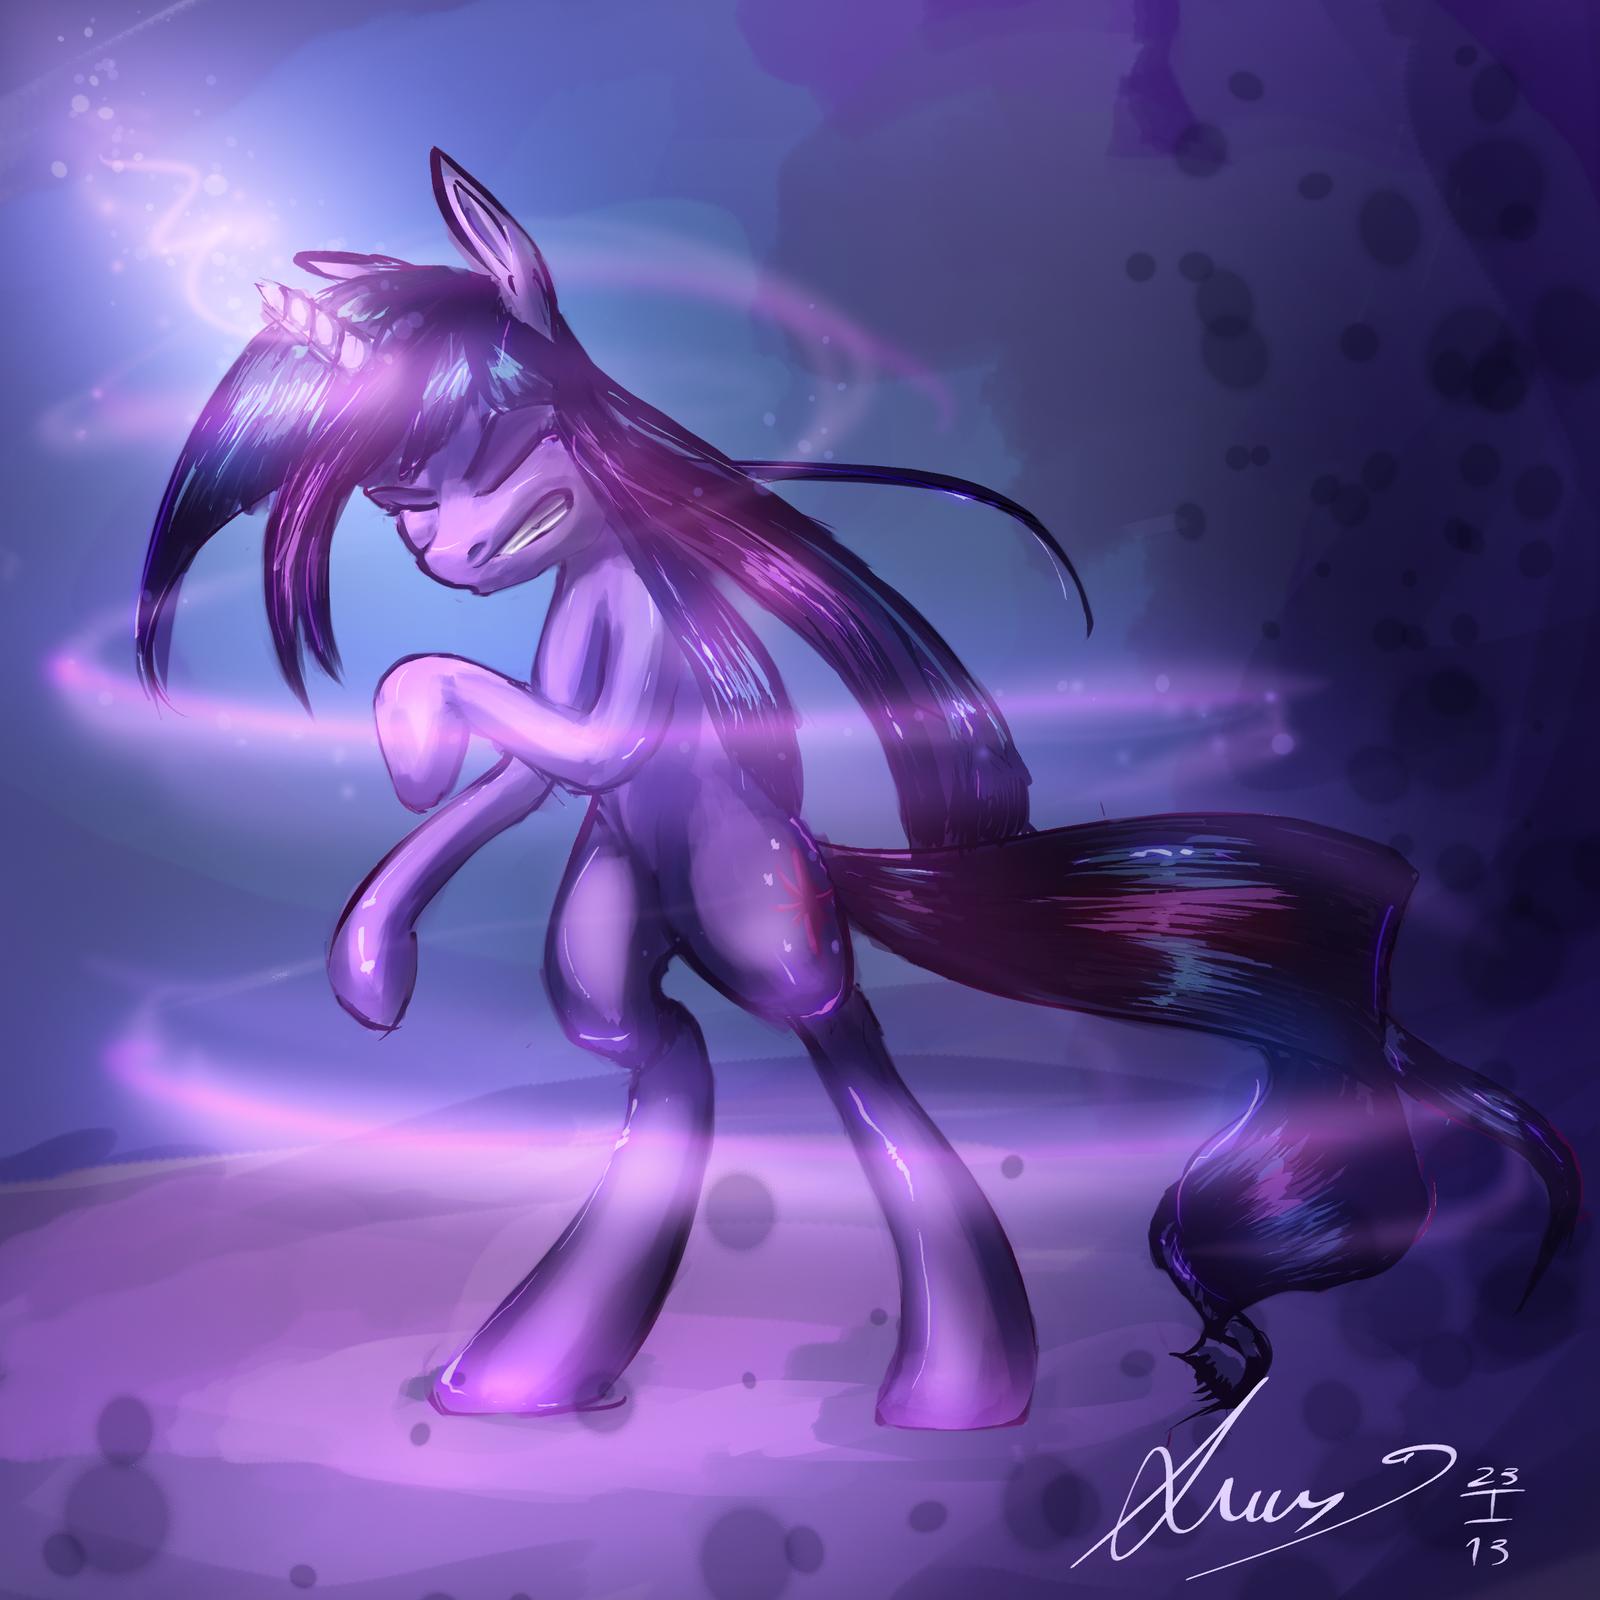 Element of magic by Alumx